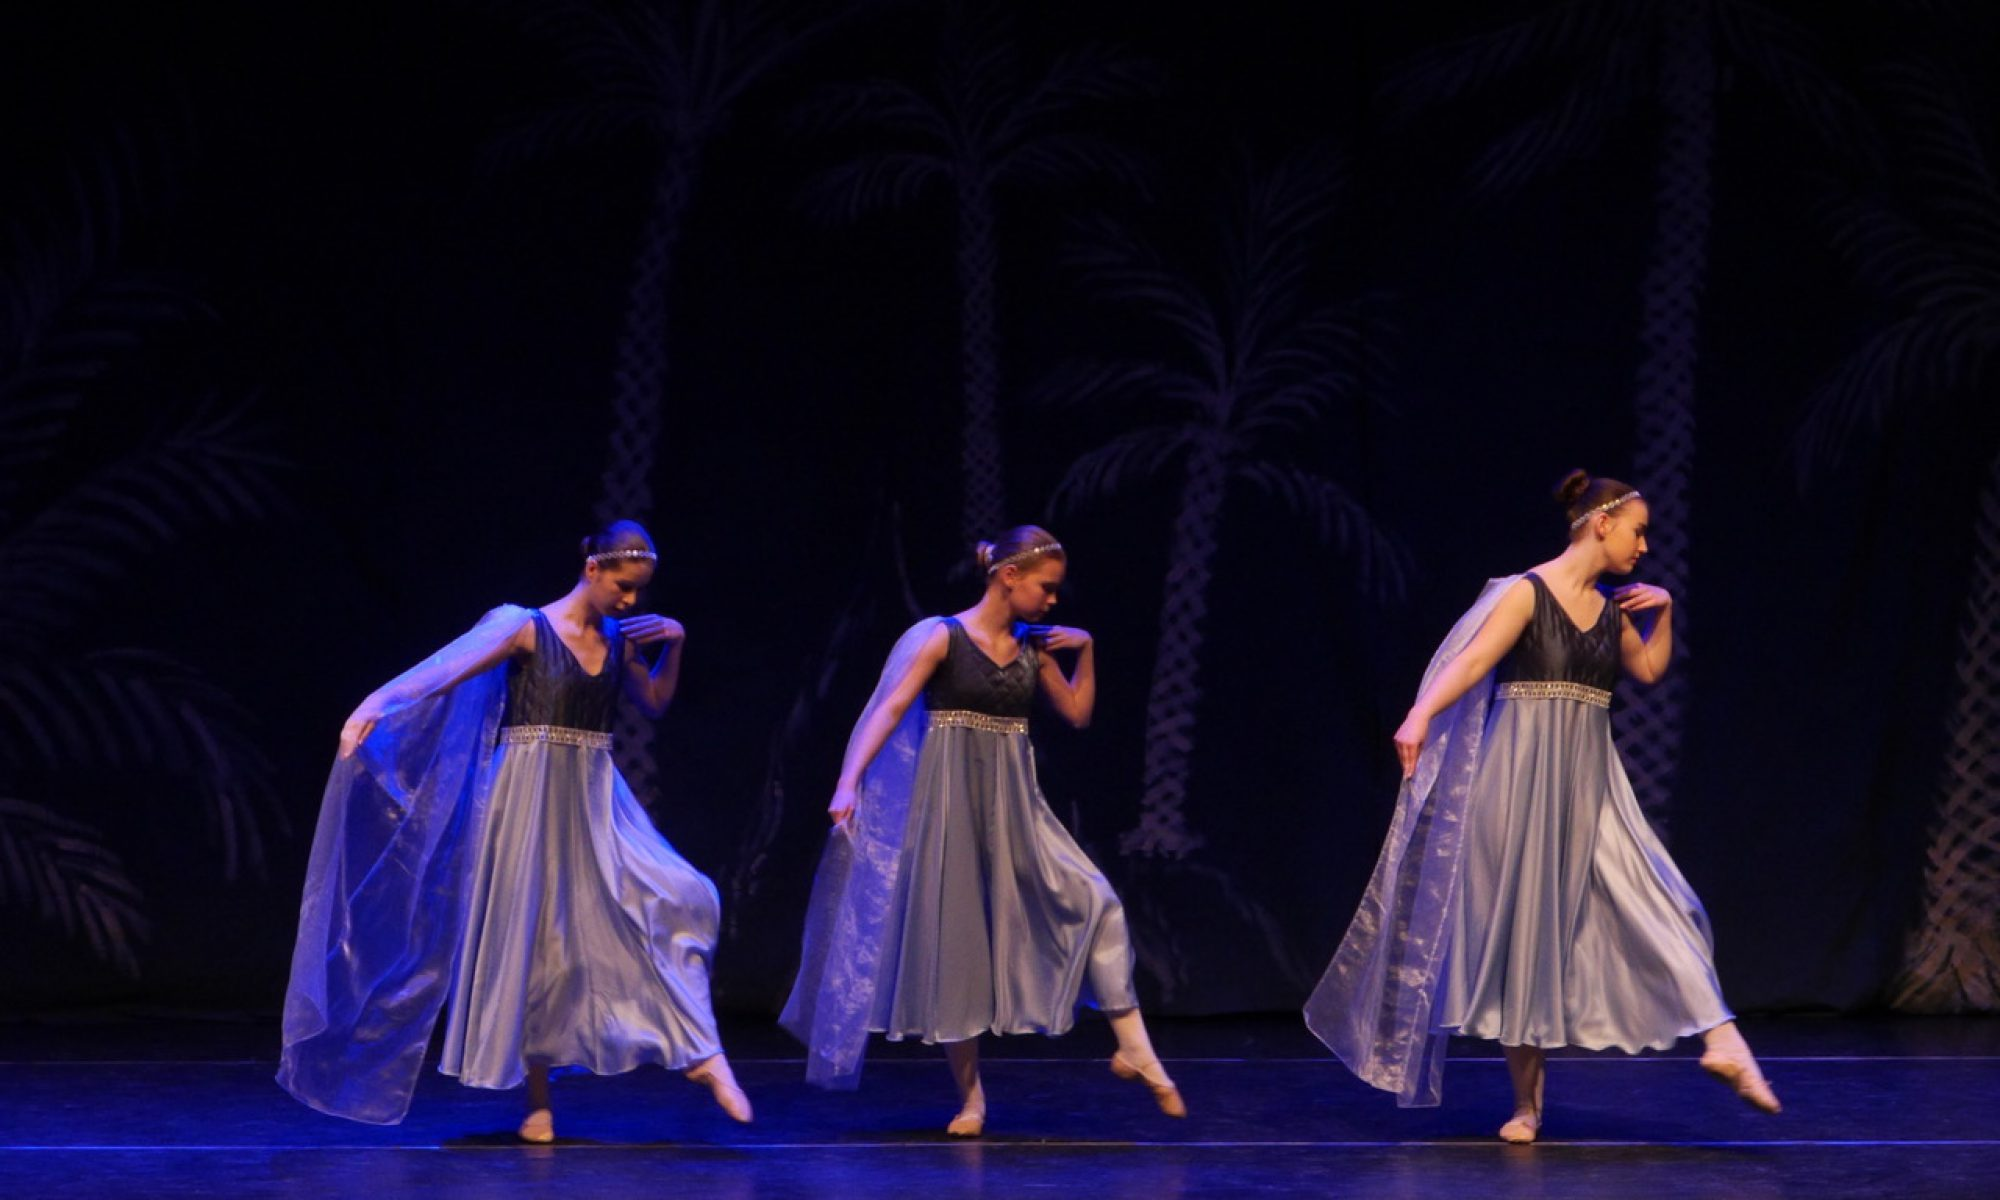 Ballettschule Sauer